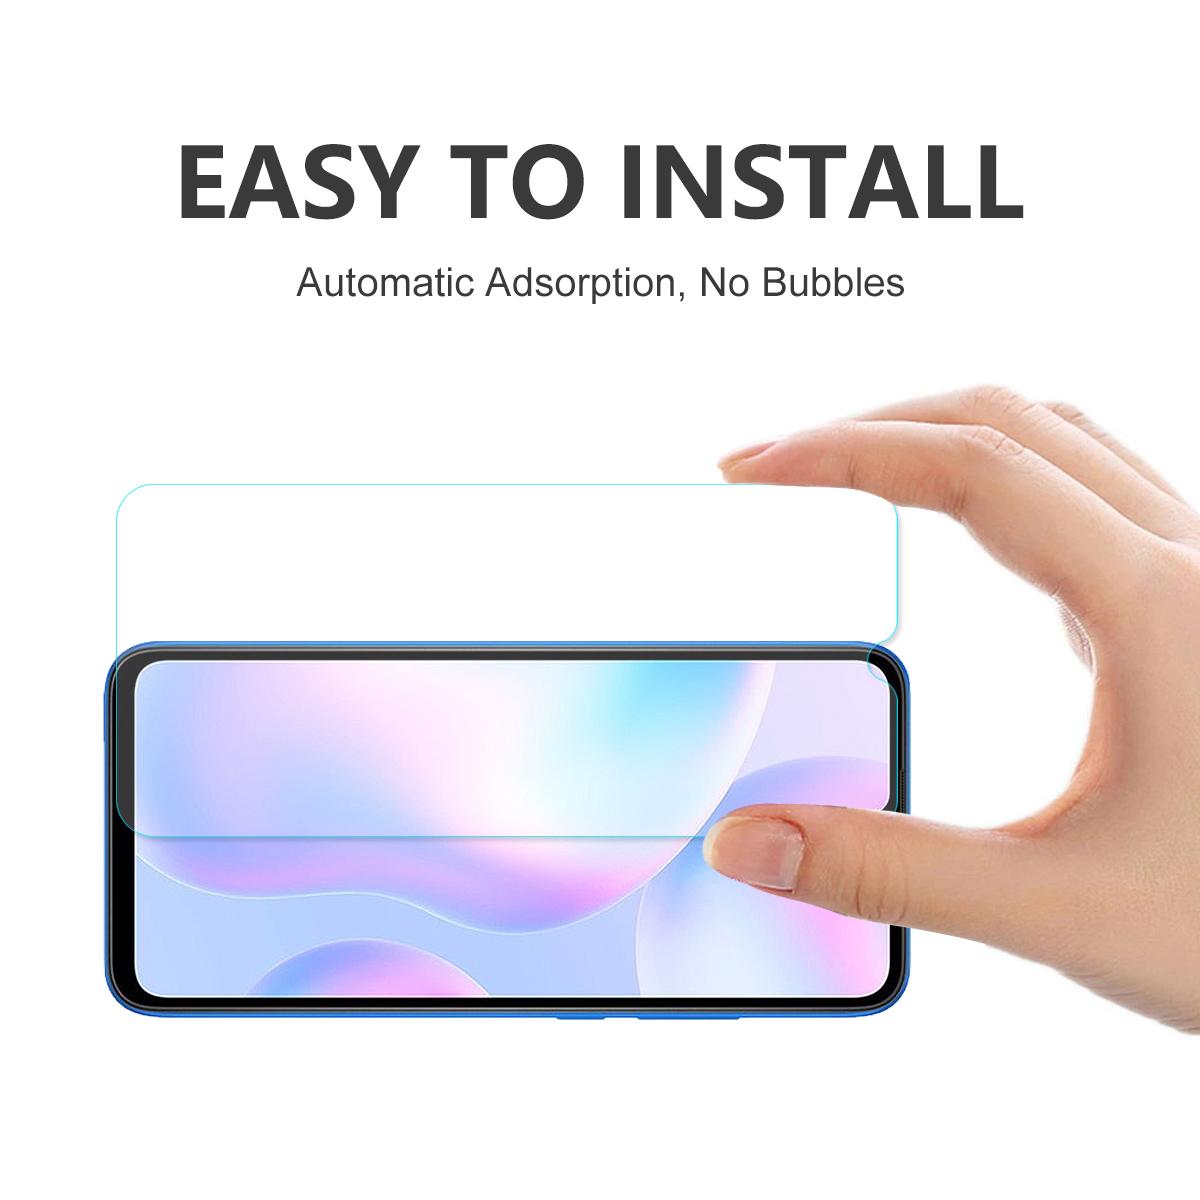 ENKAY 1/2/5/10 Pcs 9H Anti-Explosion Tempered Glass Screen Protector for Xiaomi Redmi 9 / Xiaomi Redmi 10X 5G / Xiaomi Mi 10 Lite